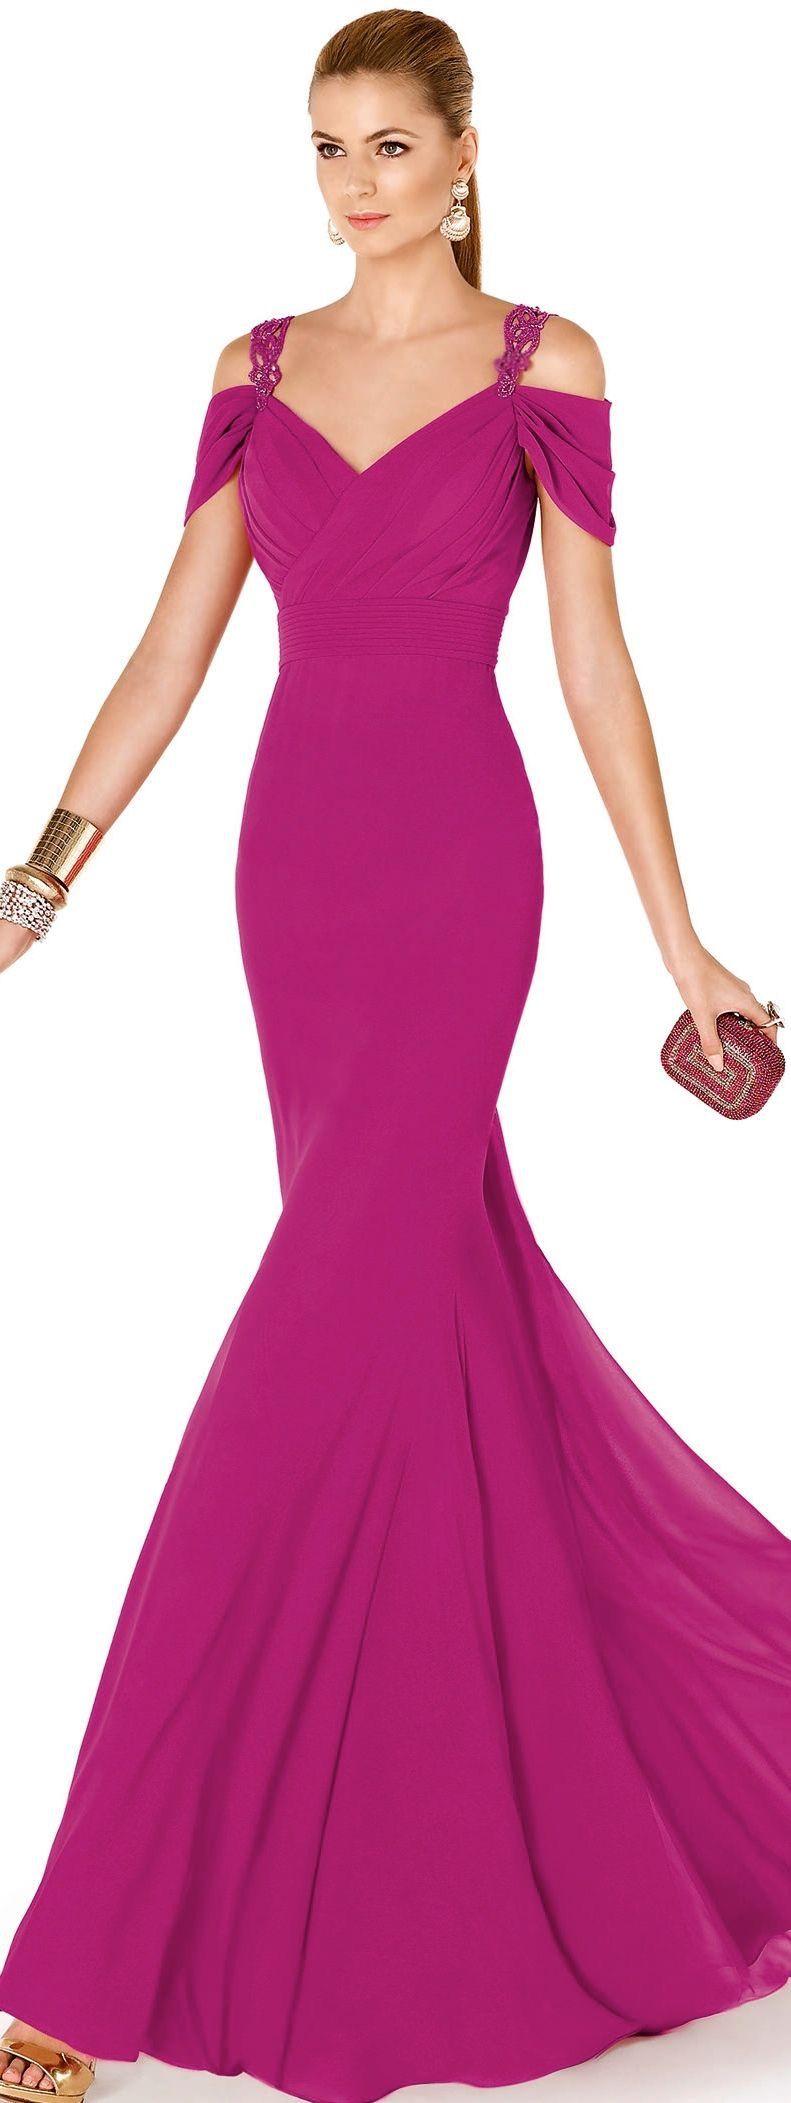 Pin de Dionne Ross en Fashion | Pinterest | Vestiditos, Vestidos de ...